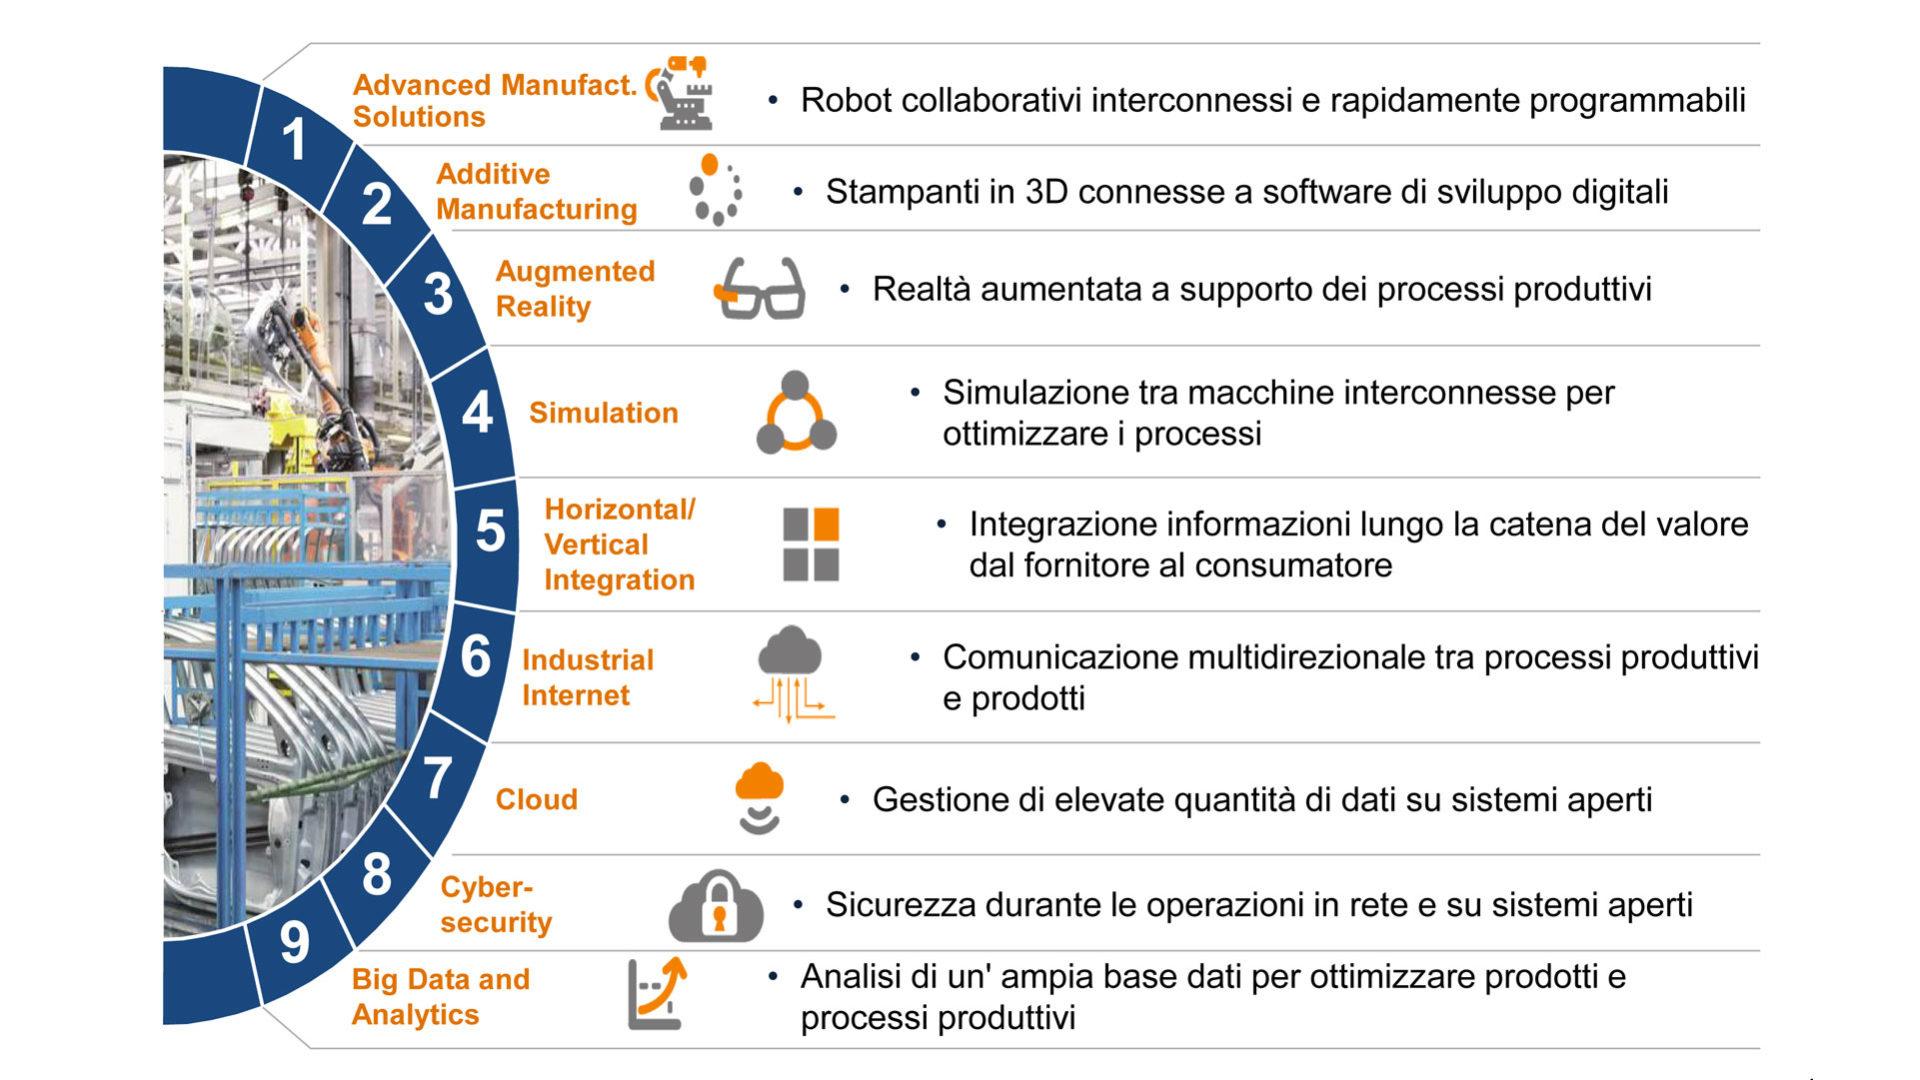 Le tecnologie abilitanti Industria 4.0